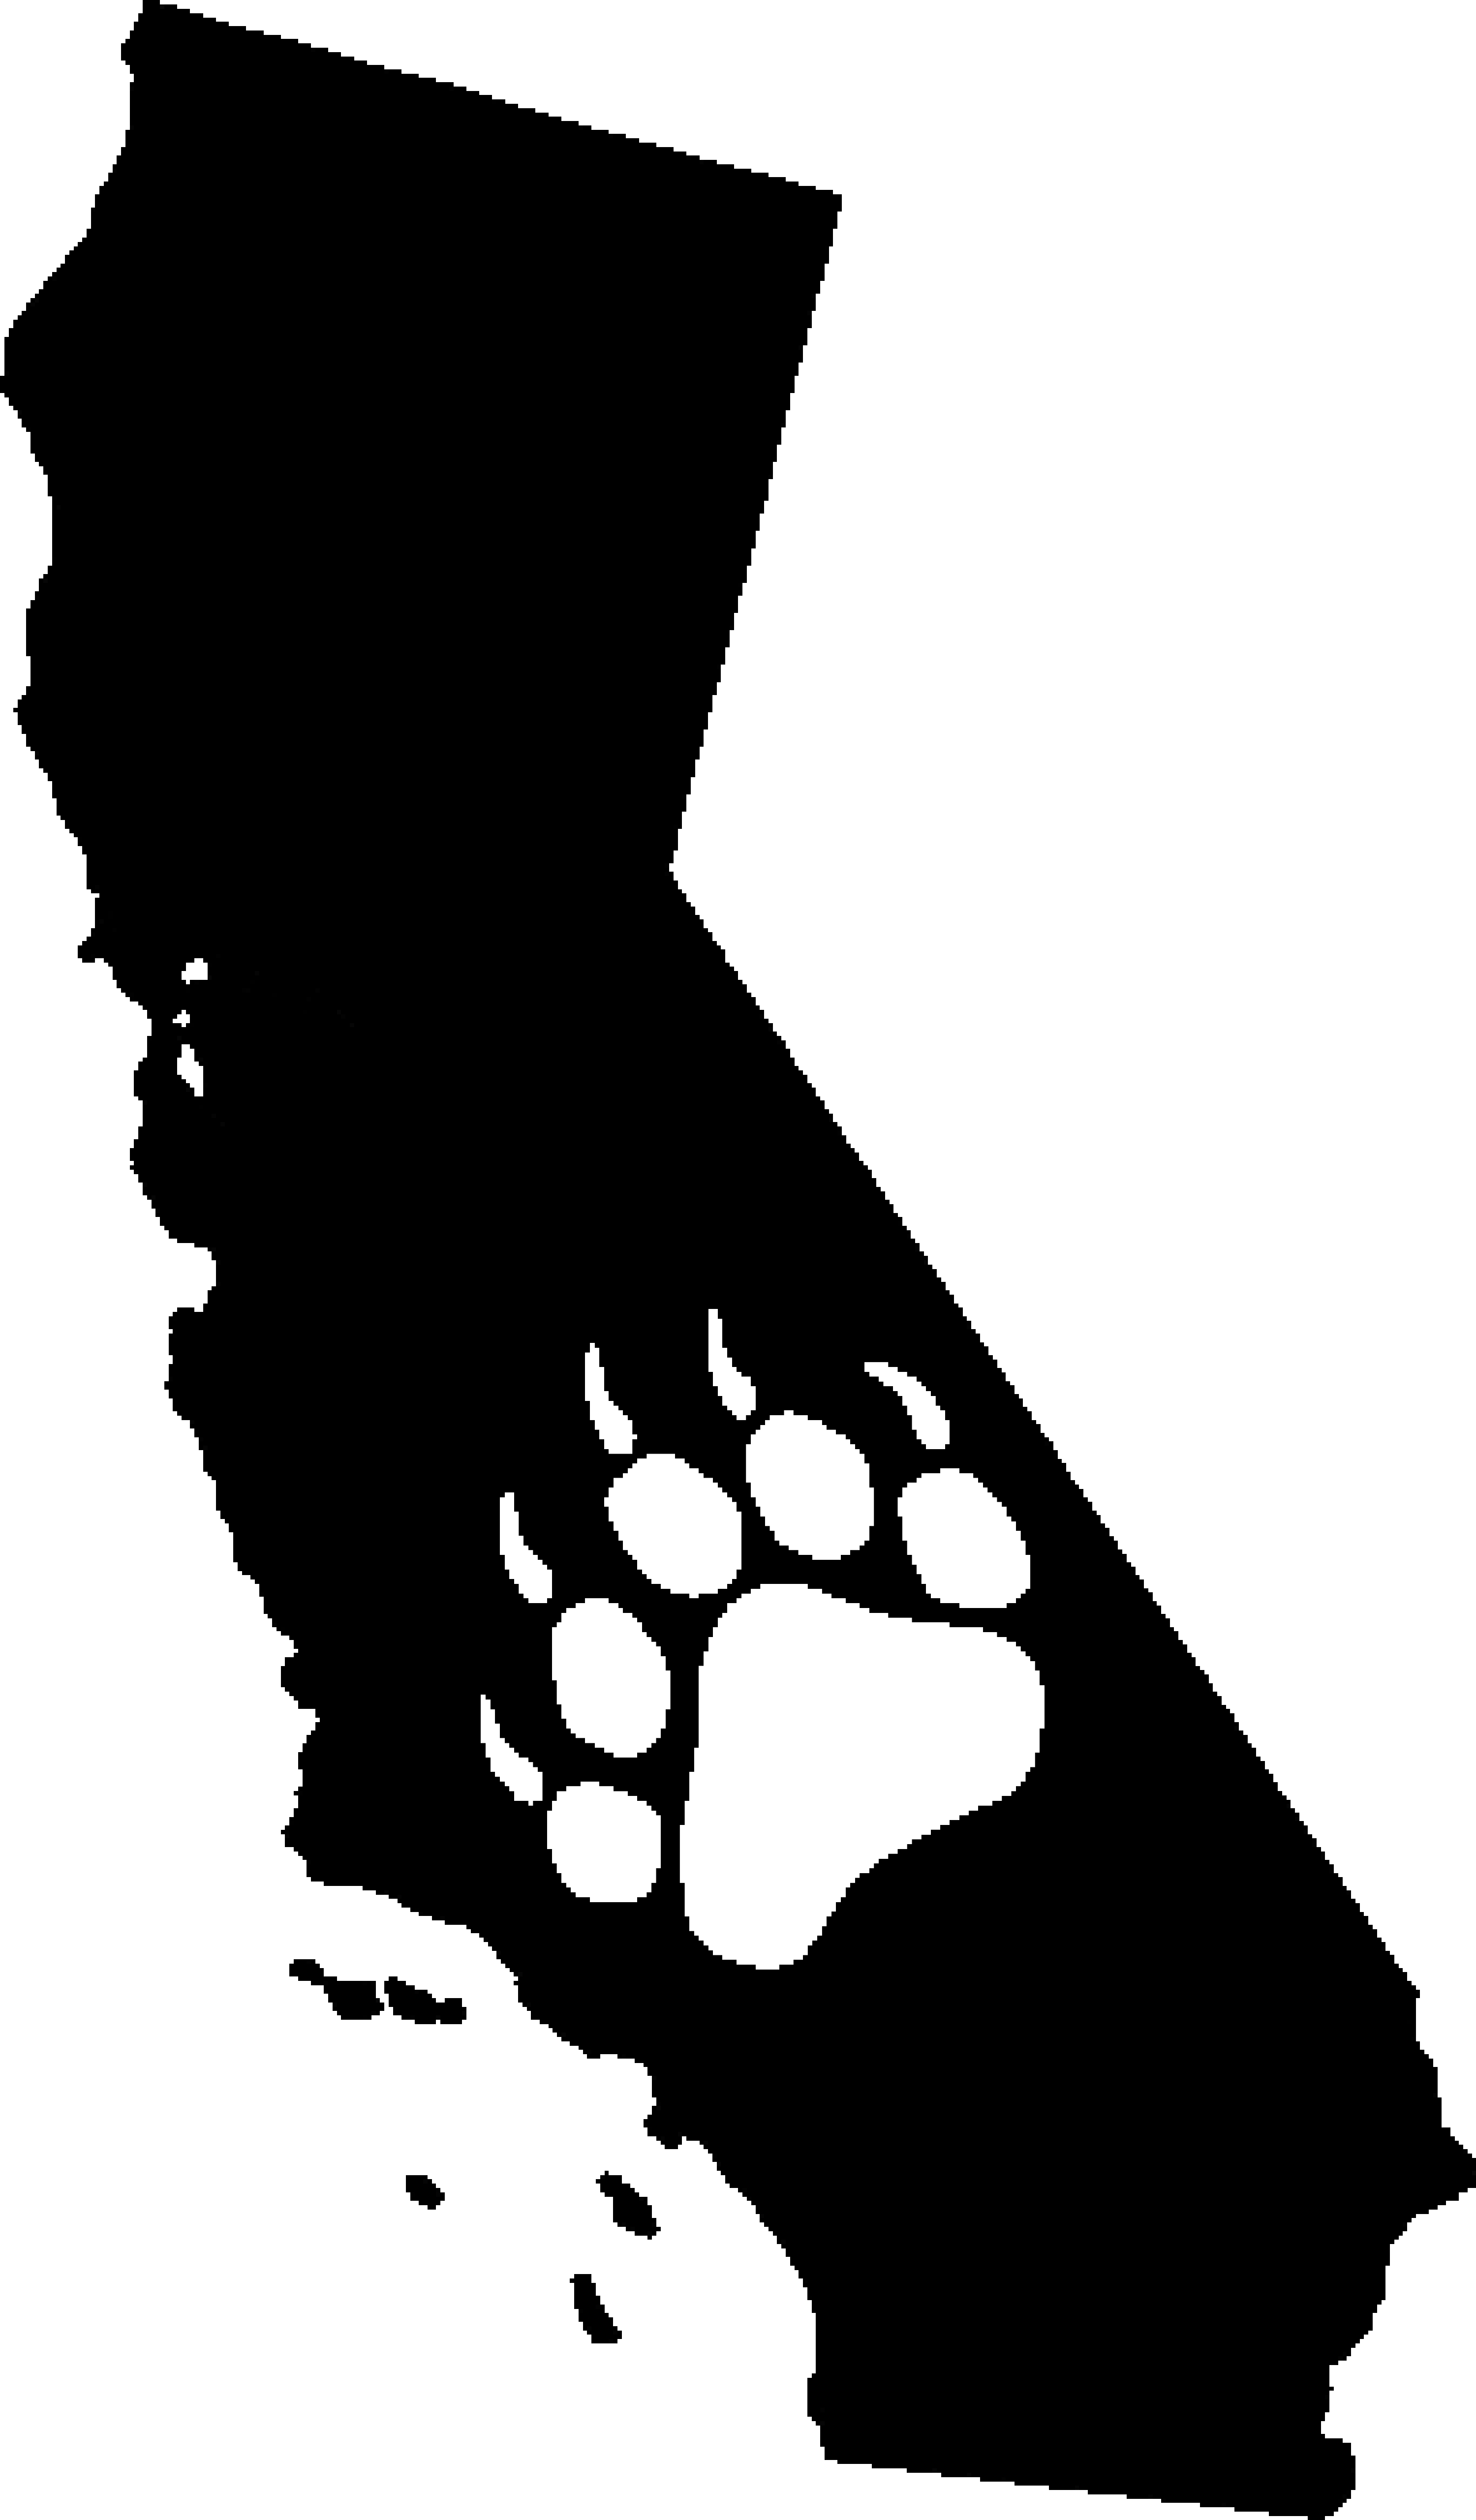 California clipart symbol california. Free bear download clip